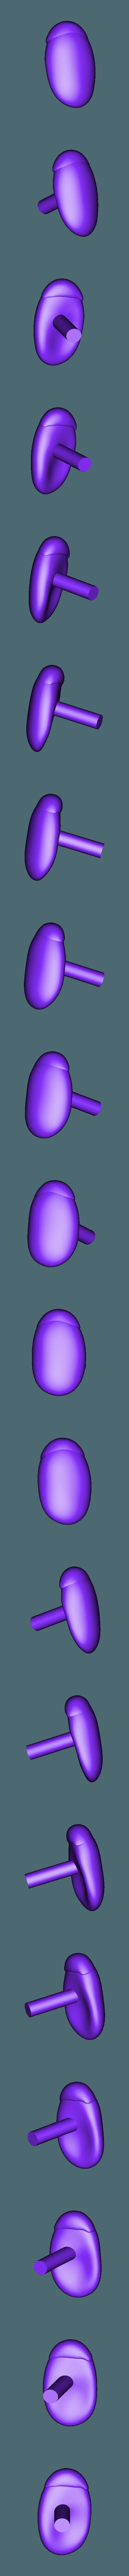 left_eye.stl Download free STL file Mr. Potato Head [Toy Story] • 3D printer template, Dream_it_Model_it